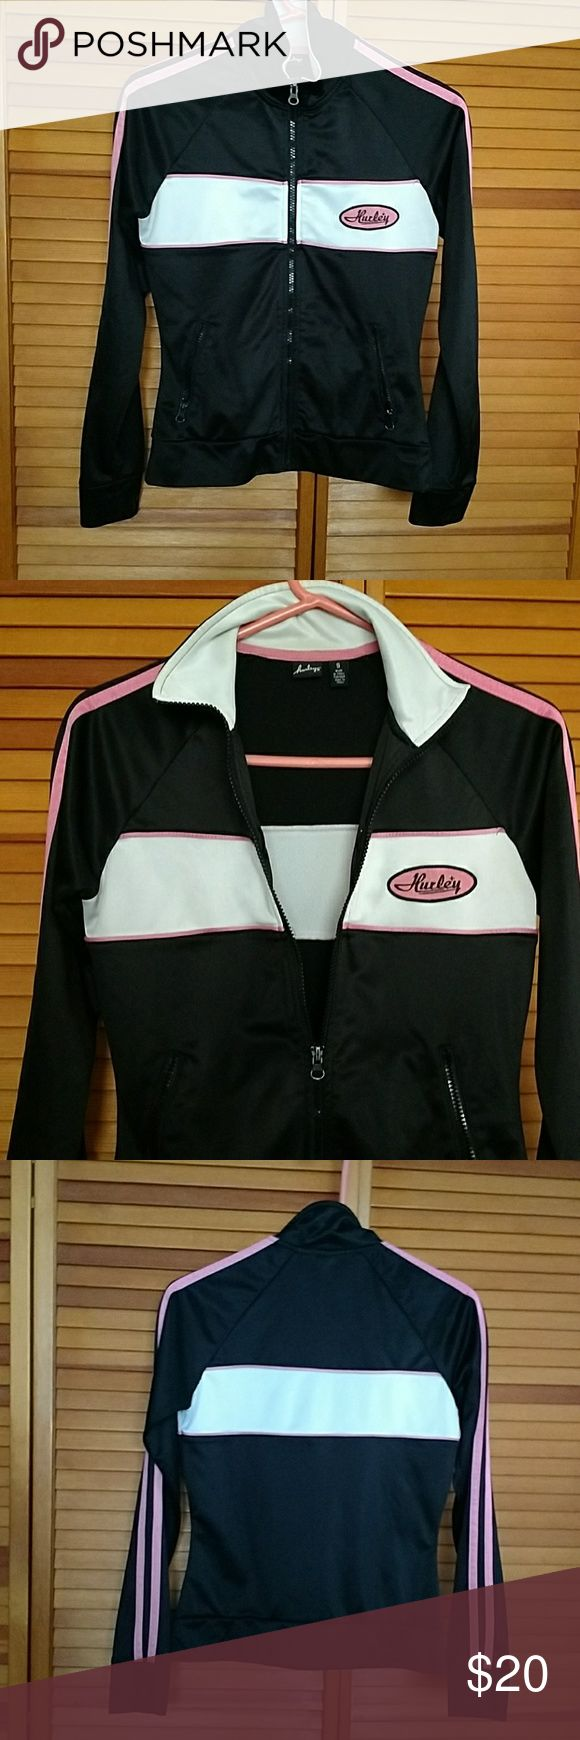 Hurley zip up jacket Zip up jacket has Hurley logo on the front of the jacket Hurley Jackets & Coats